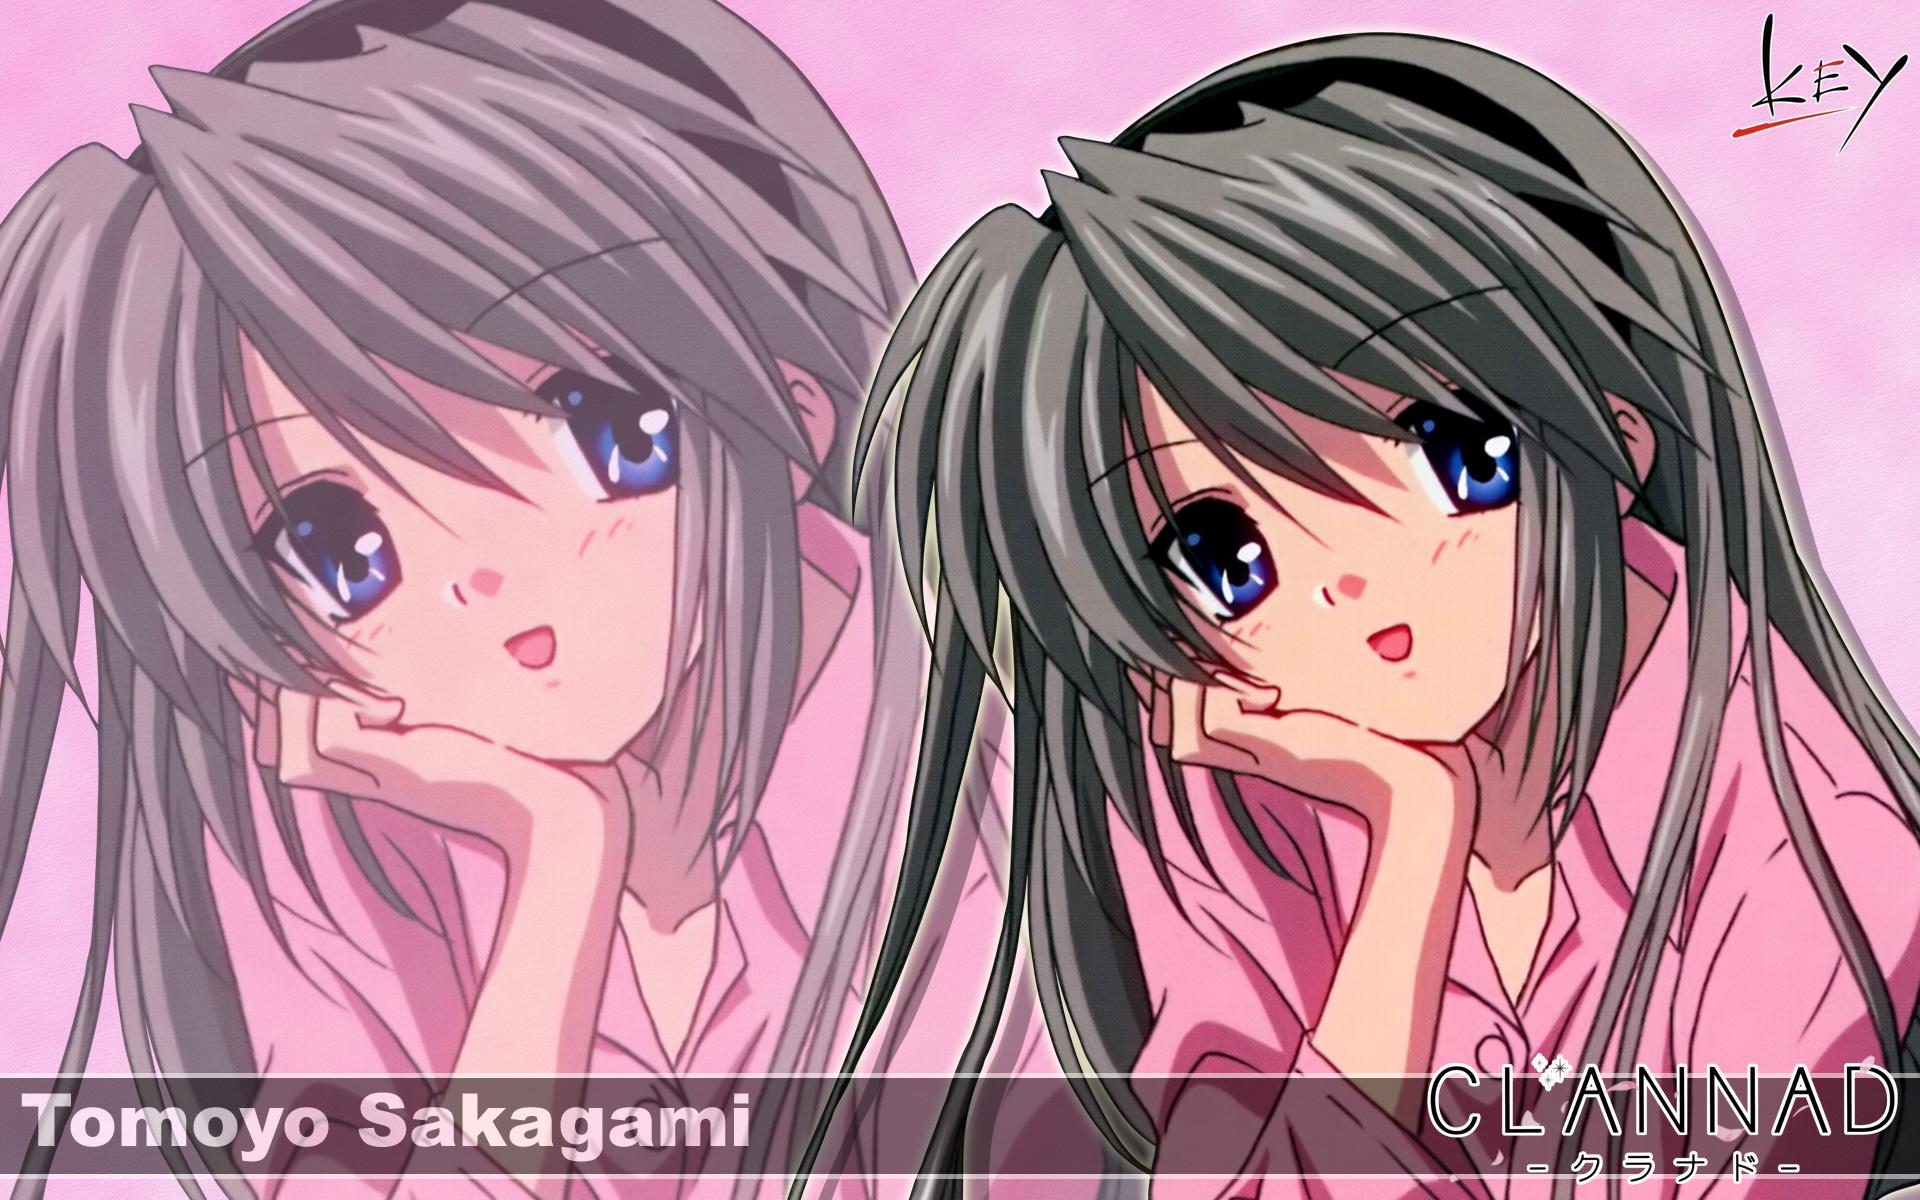 blue_eyes clannad gray_hair headband key logo long_hair sakagami_tomoyo zoom_layer